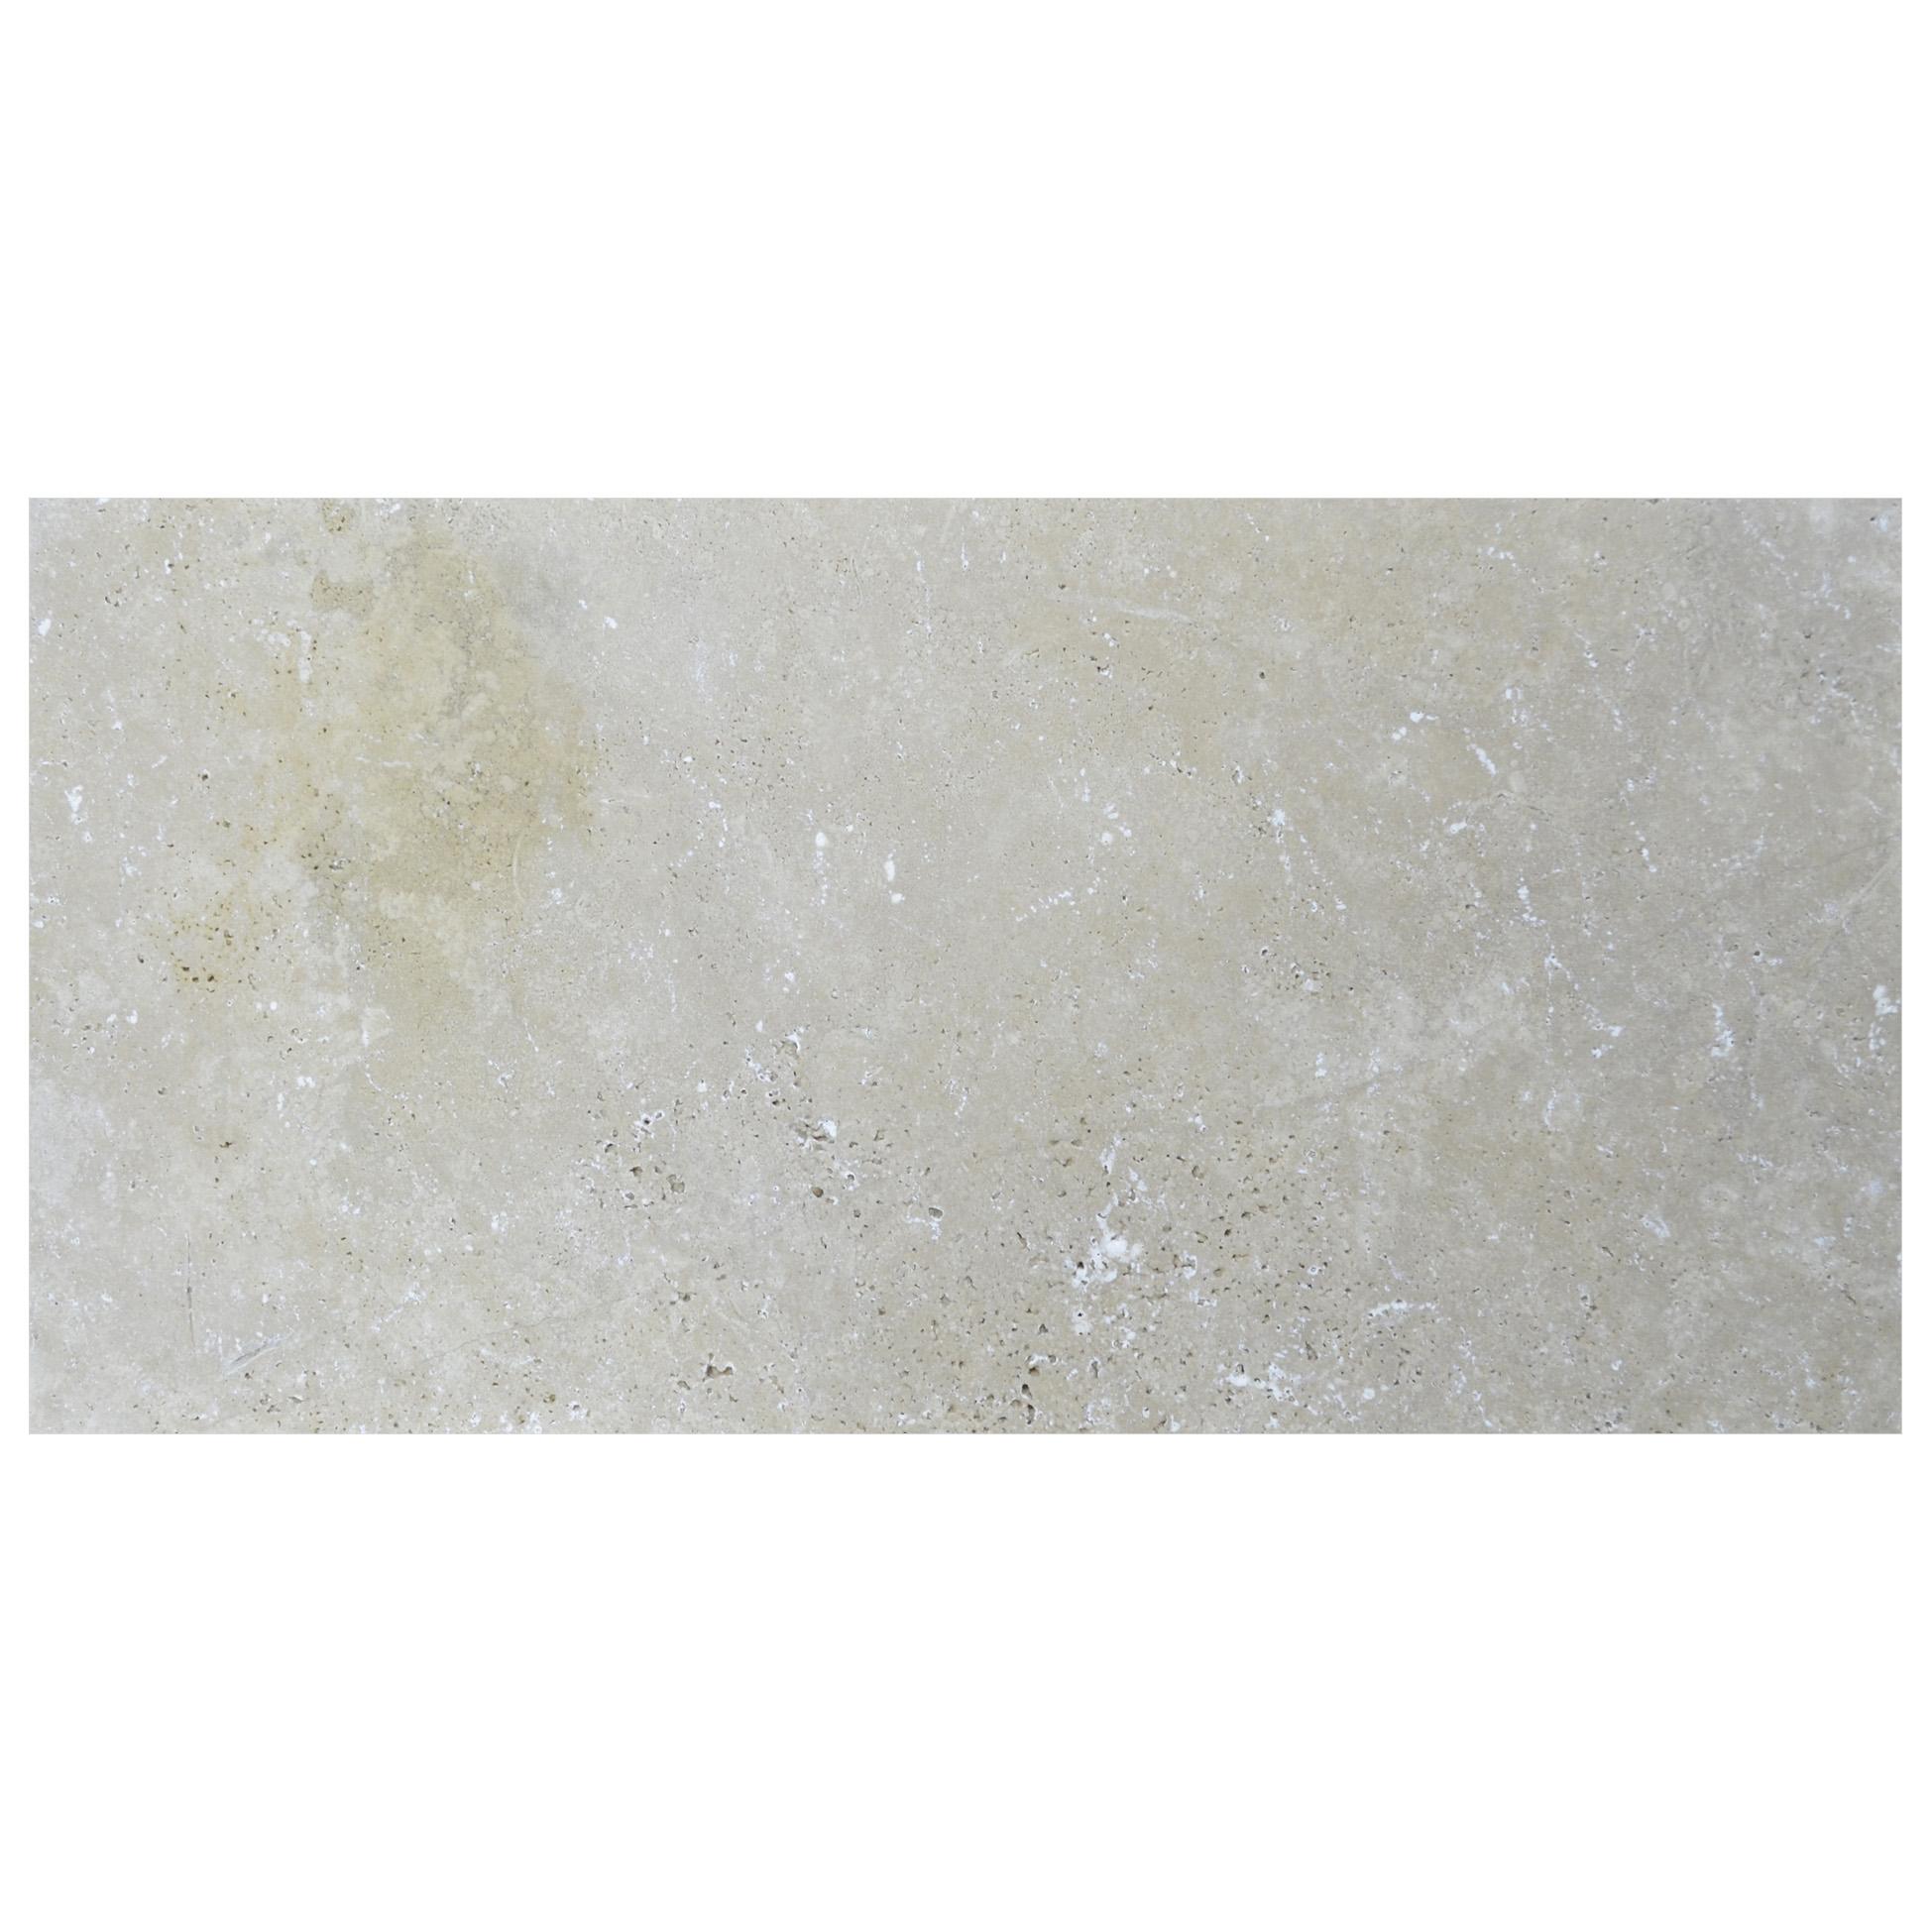 Super Light Tumbled Travertine Pavers 12x24-pavers sale-Atlantic Stone Source